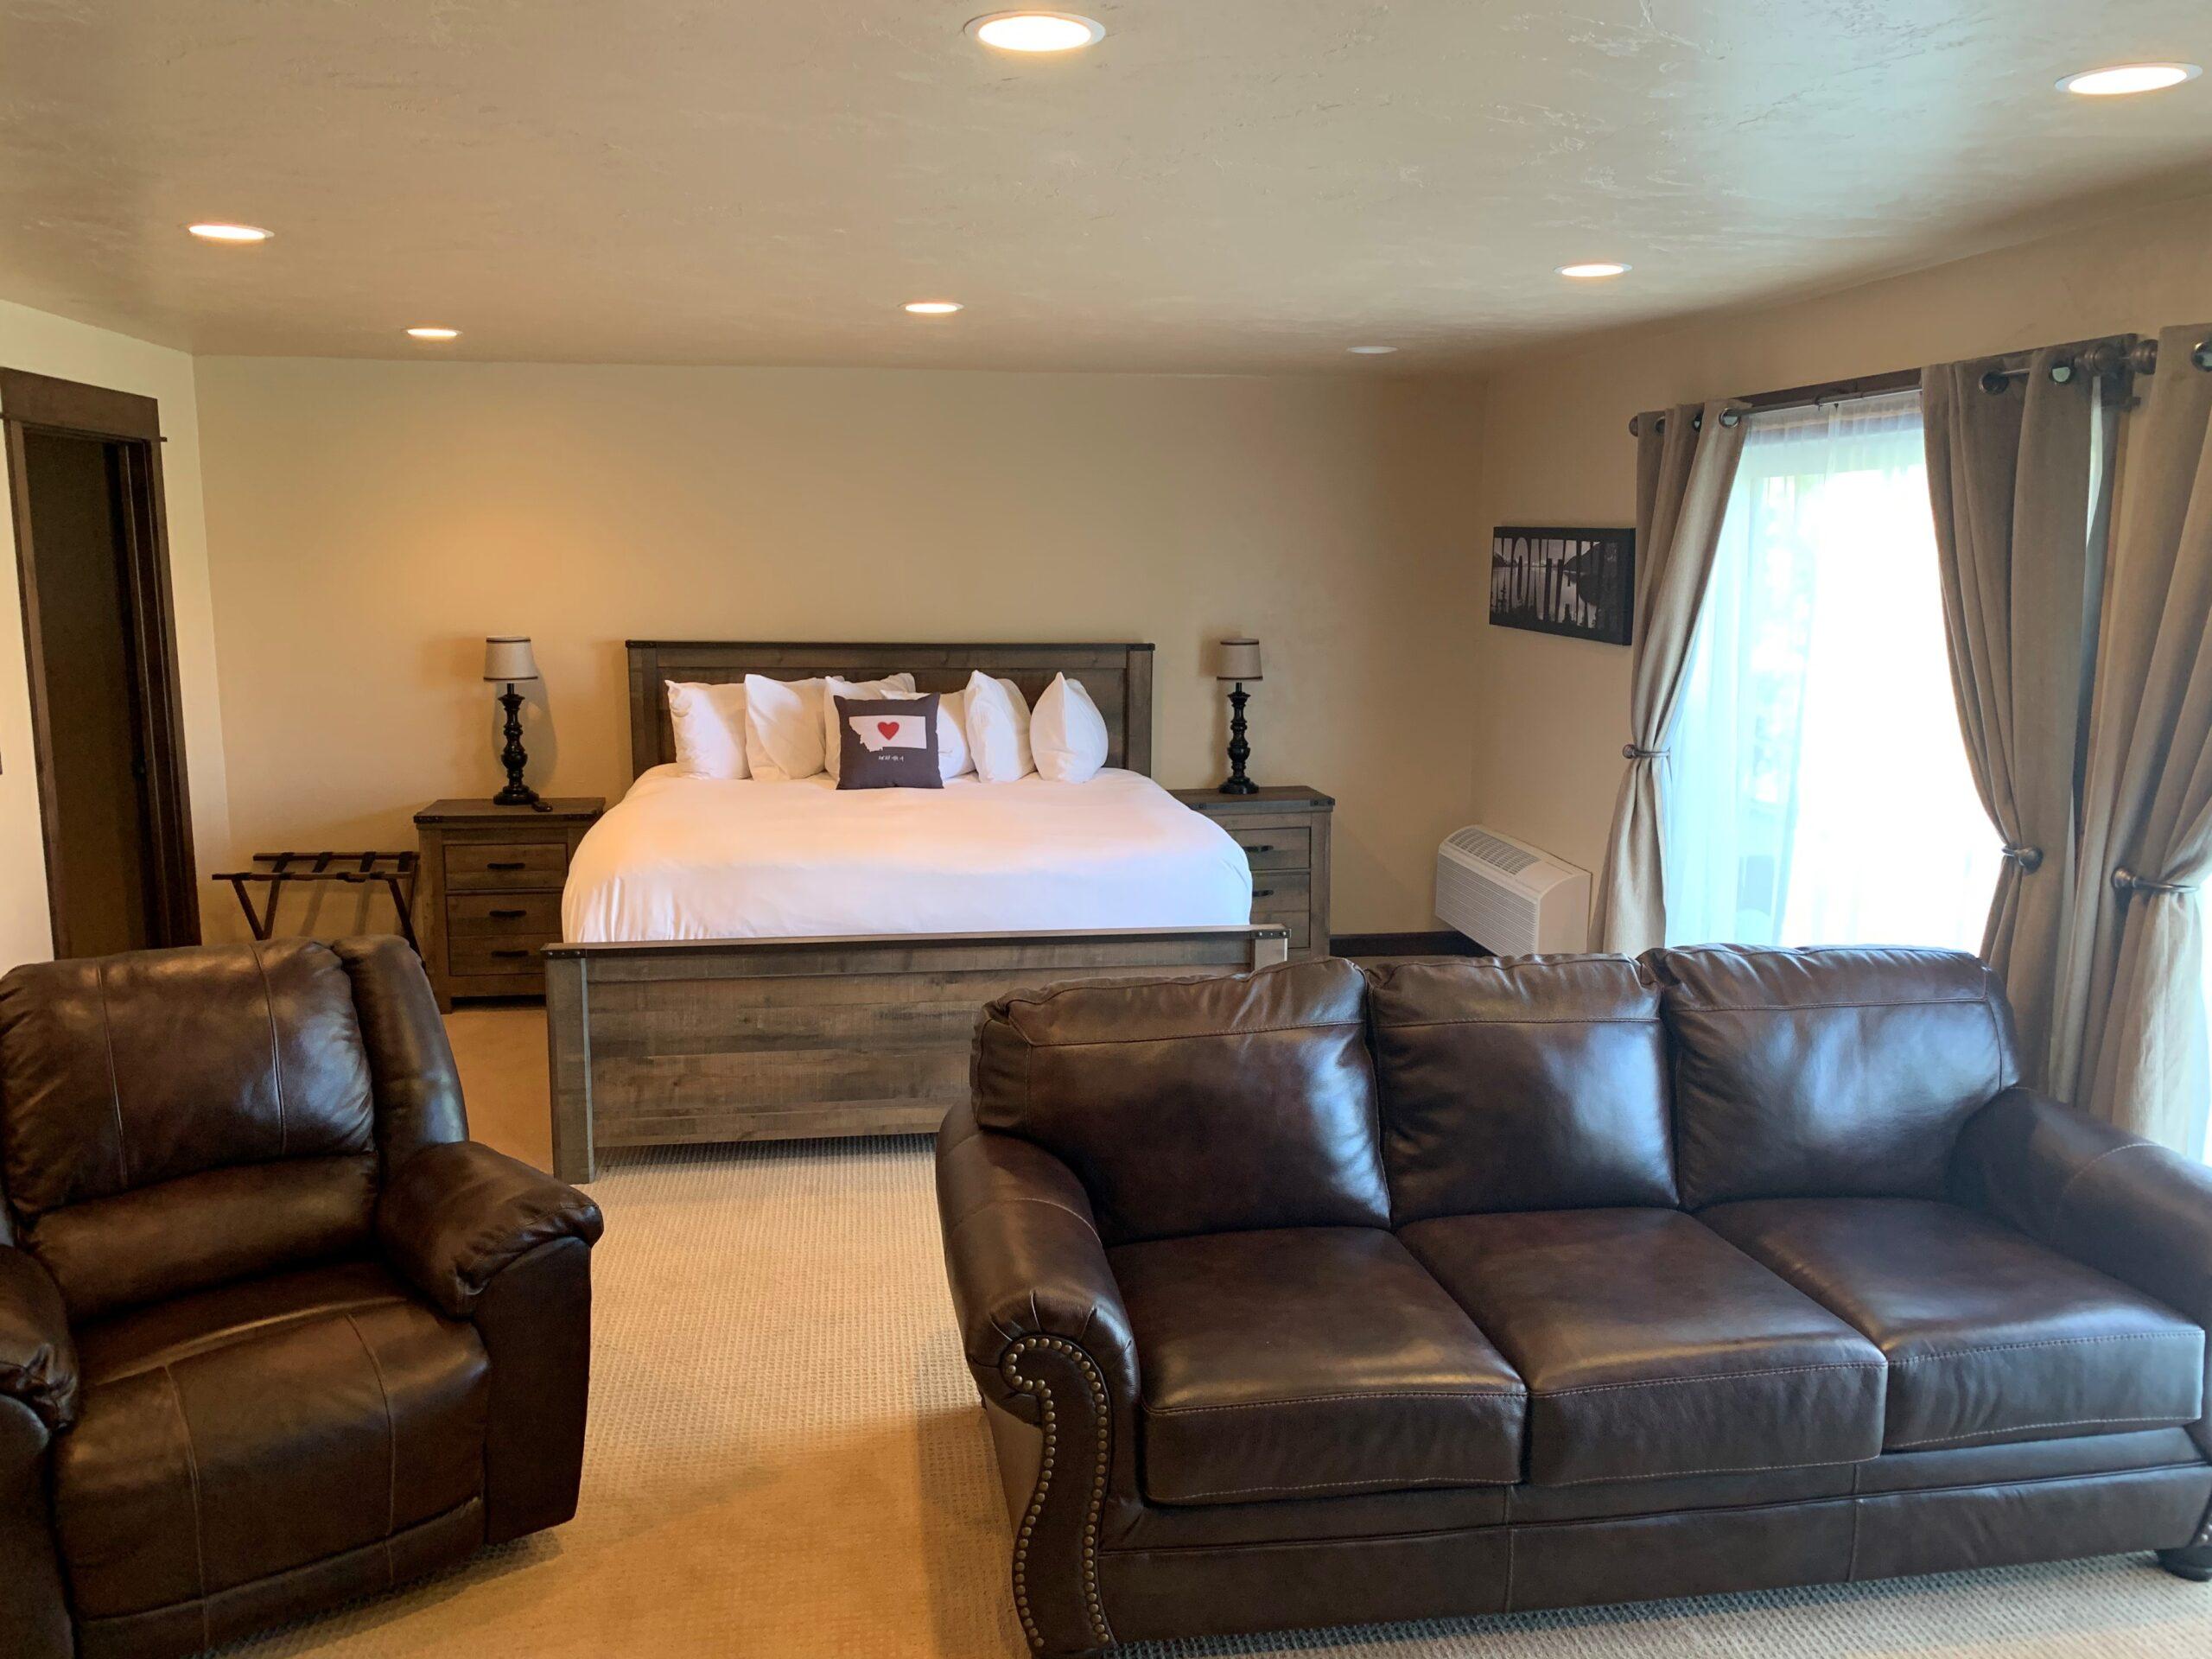 Exec Suite Bed Pic 7-27-21